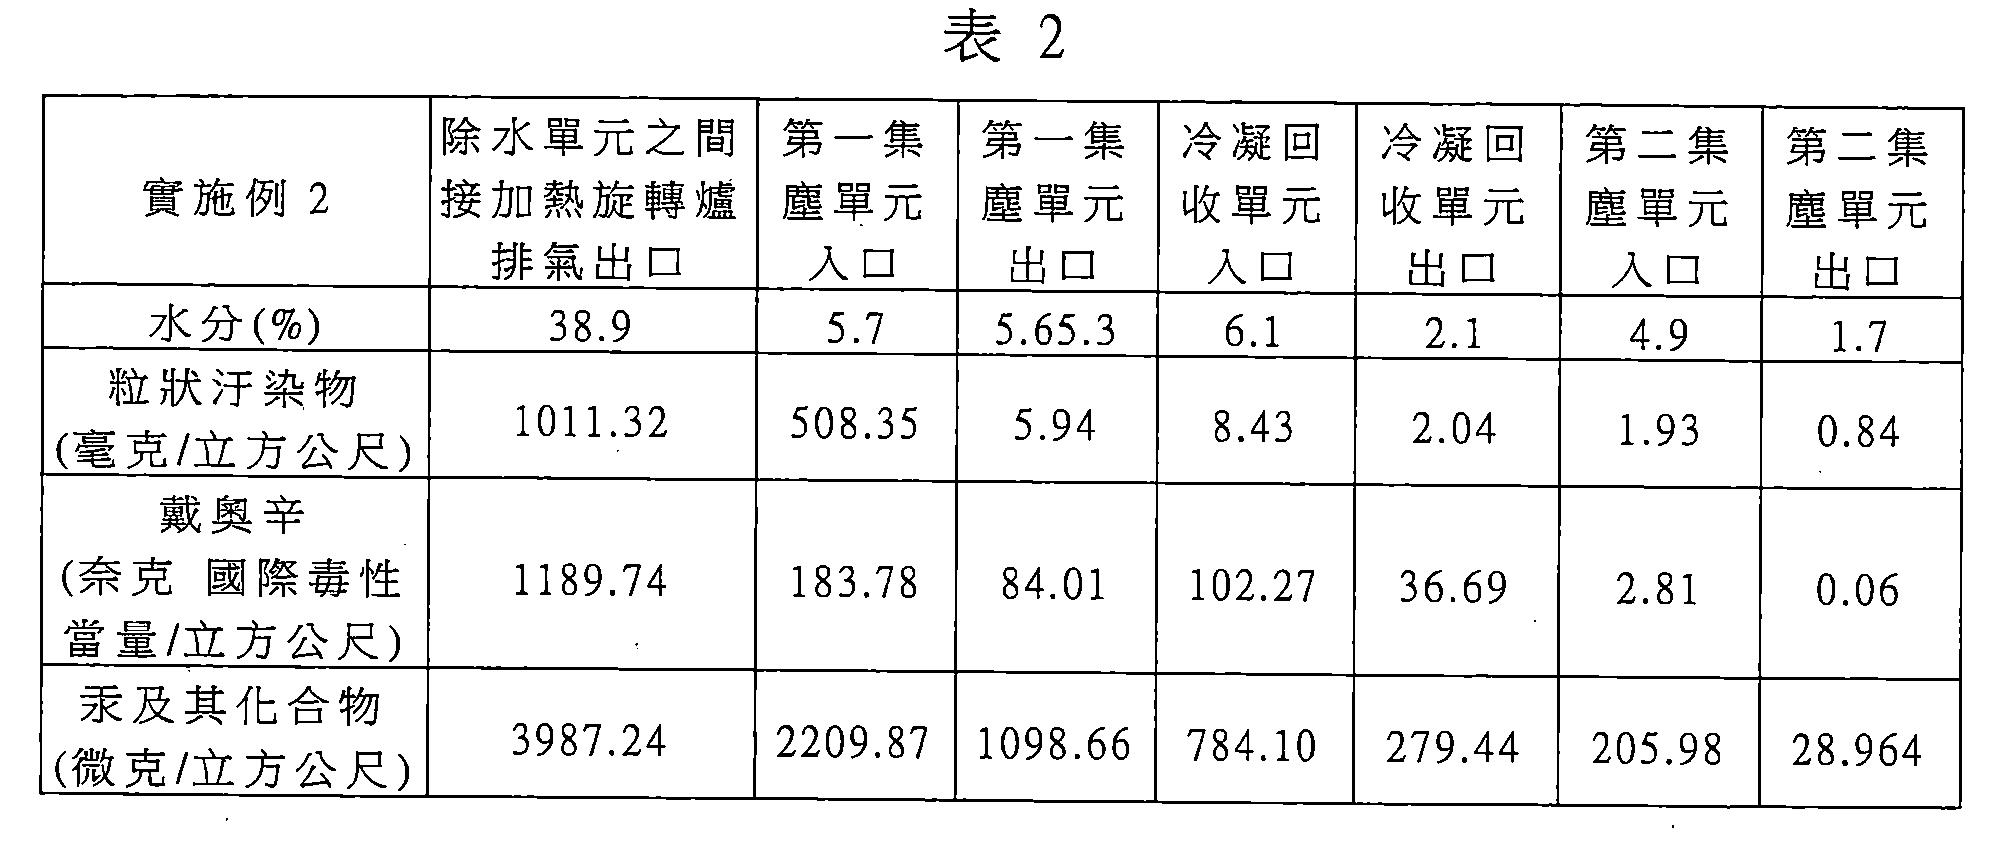 Figure 106130287-A0101-12-0013-3